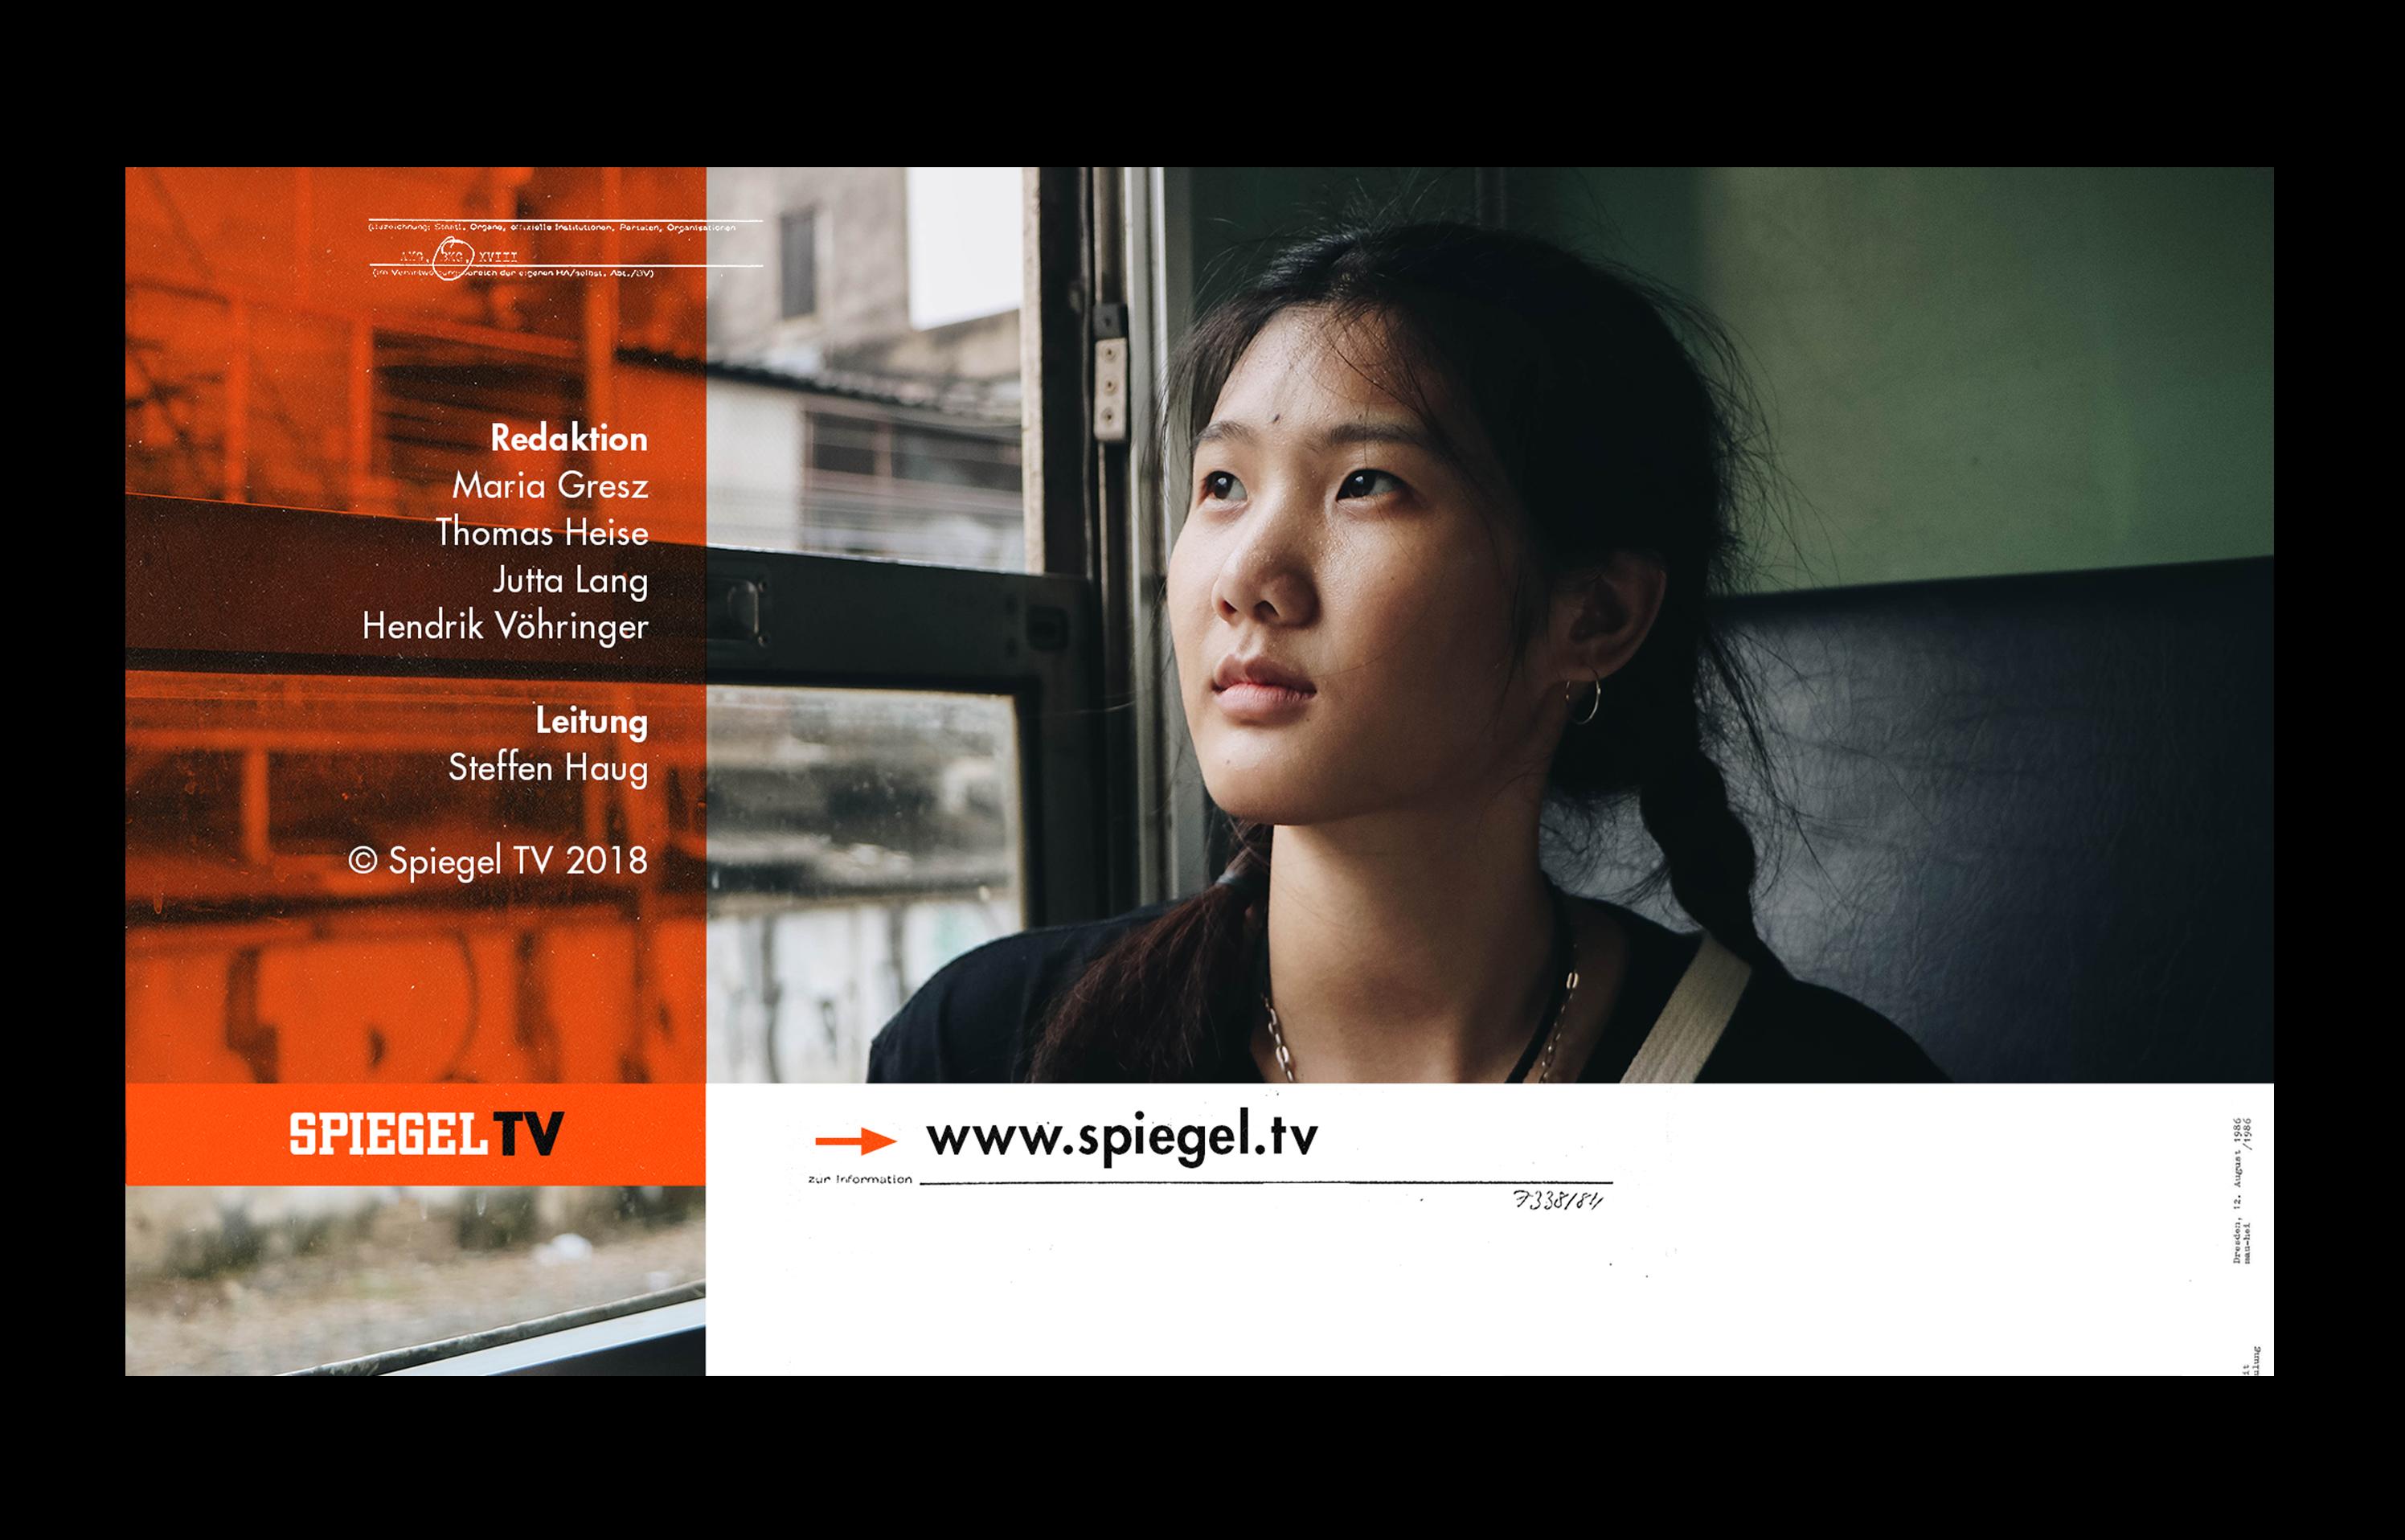 Tv In Spiegel : The logo of german publishing house der spiegel and it s tv